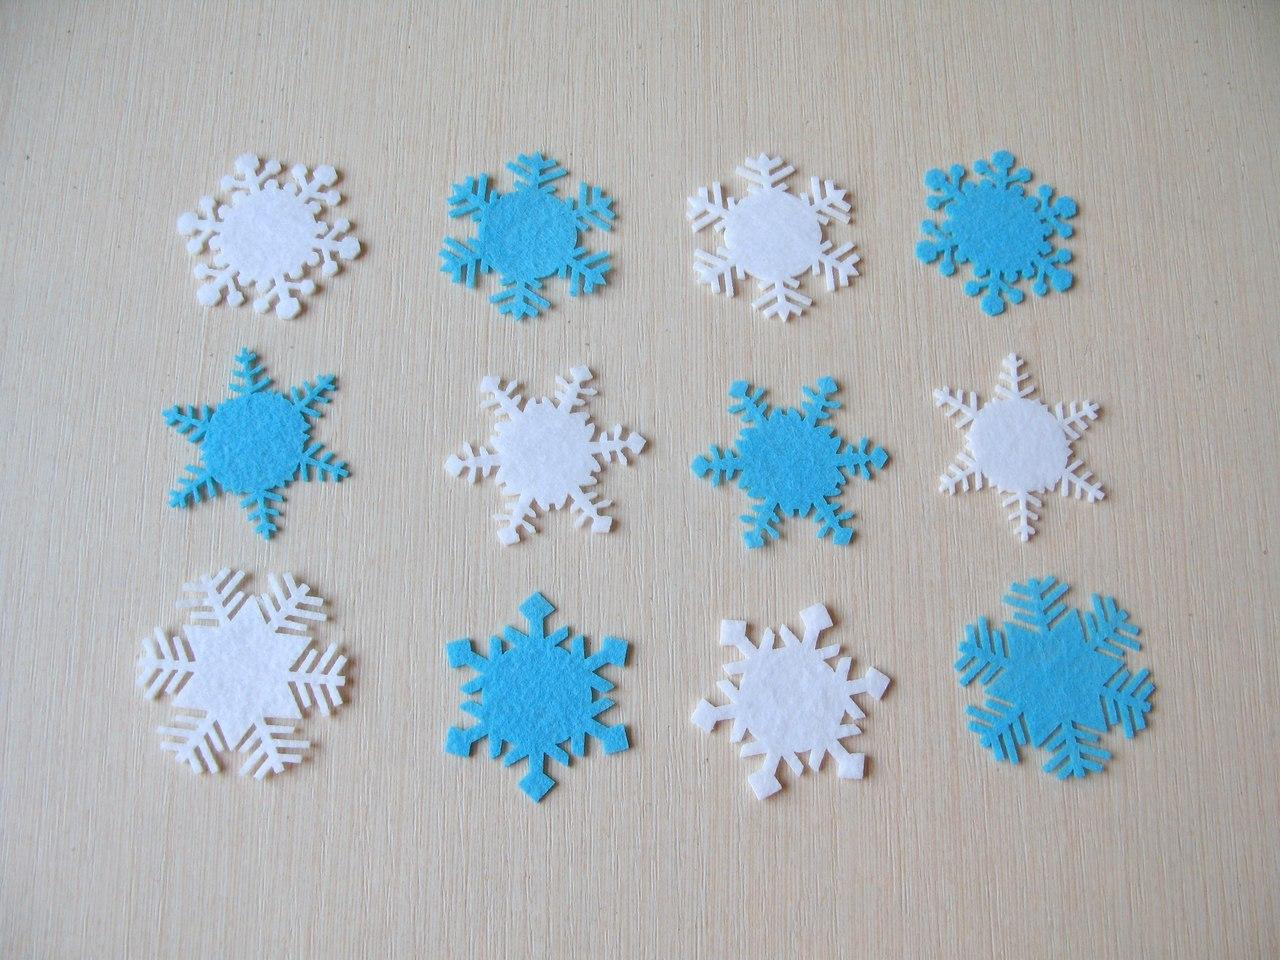 Снежинки из фетра 5 см в диаметре